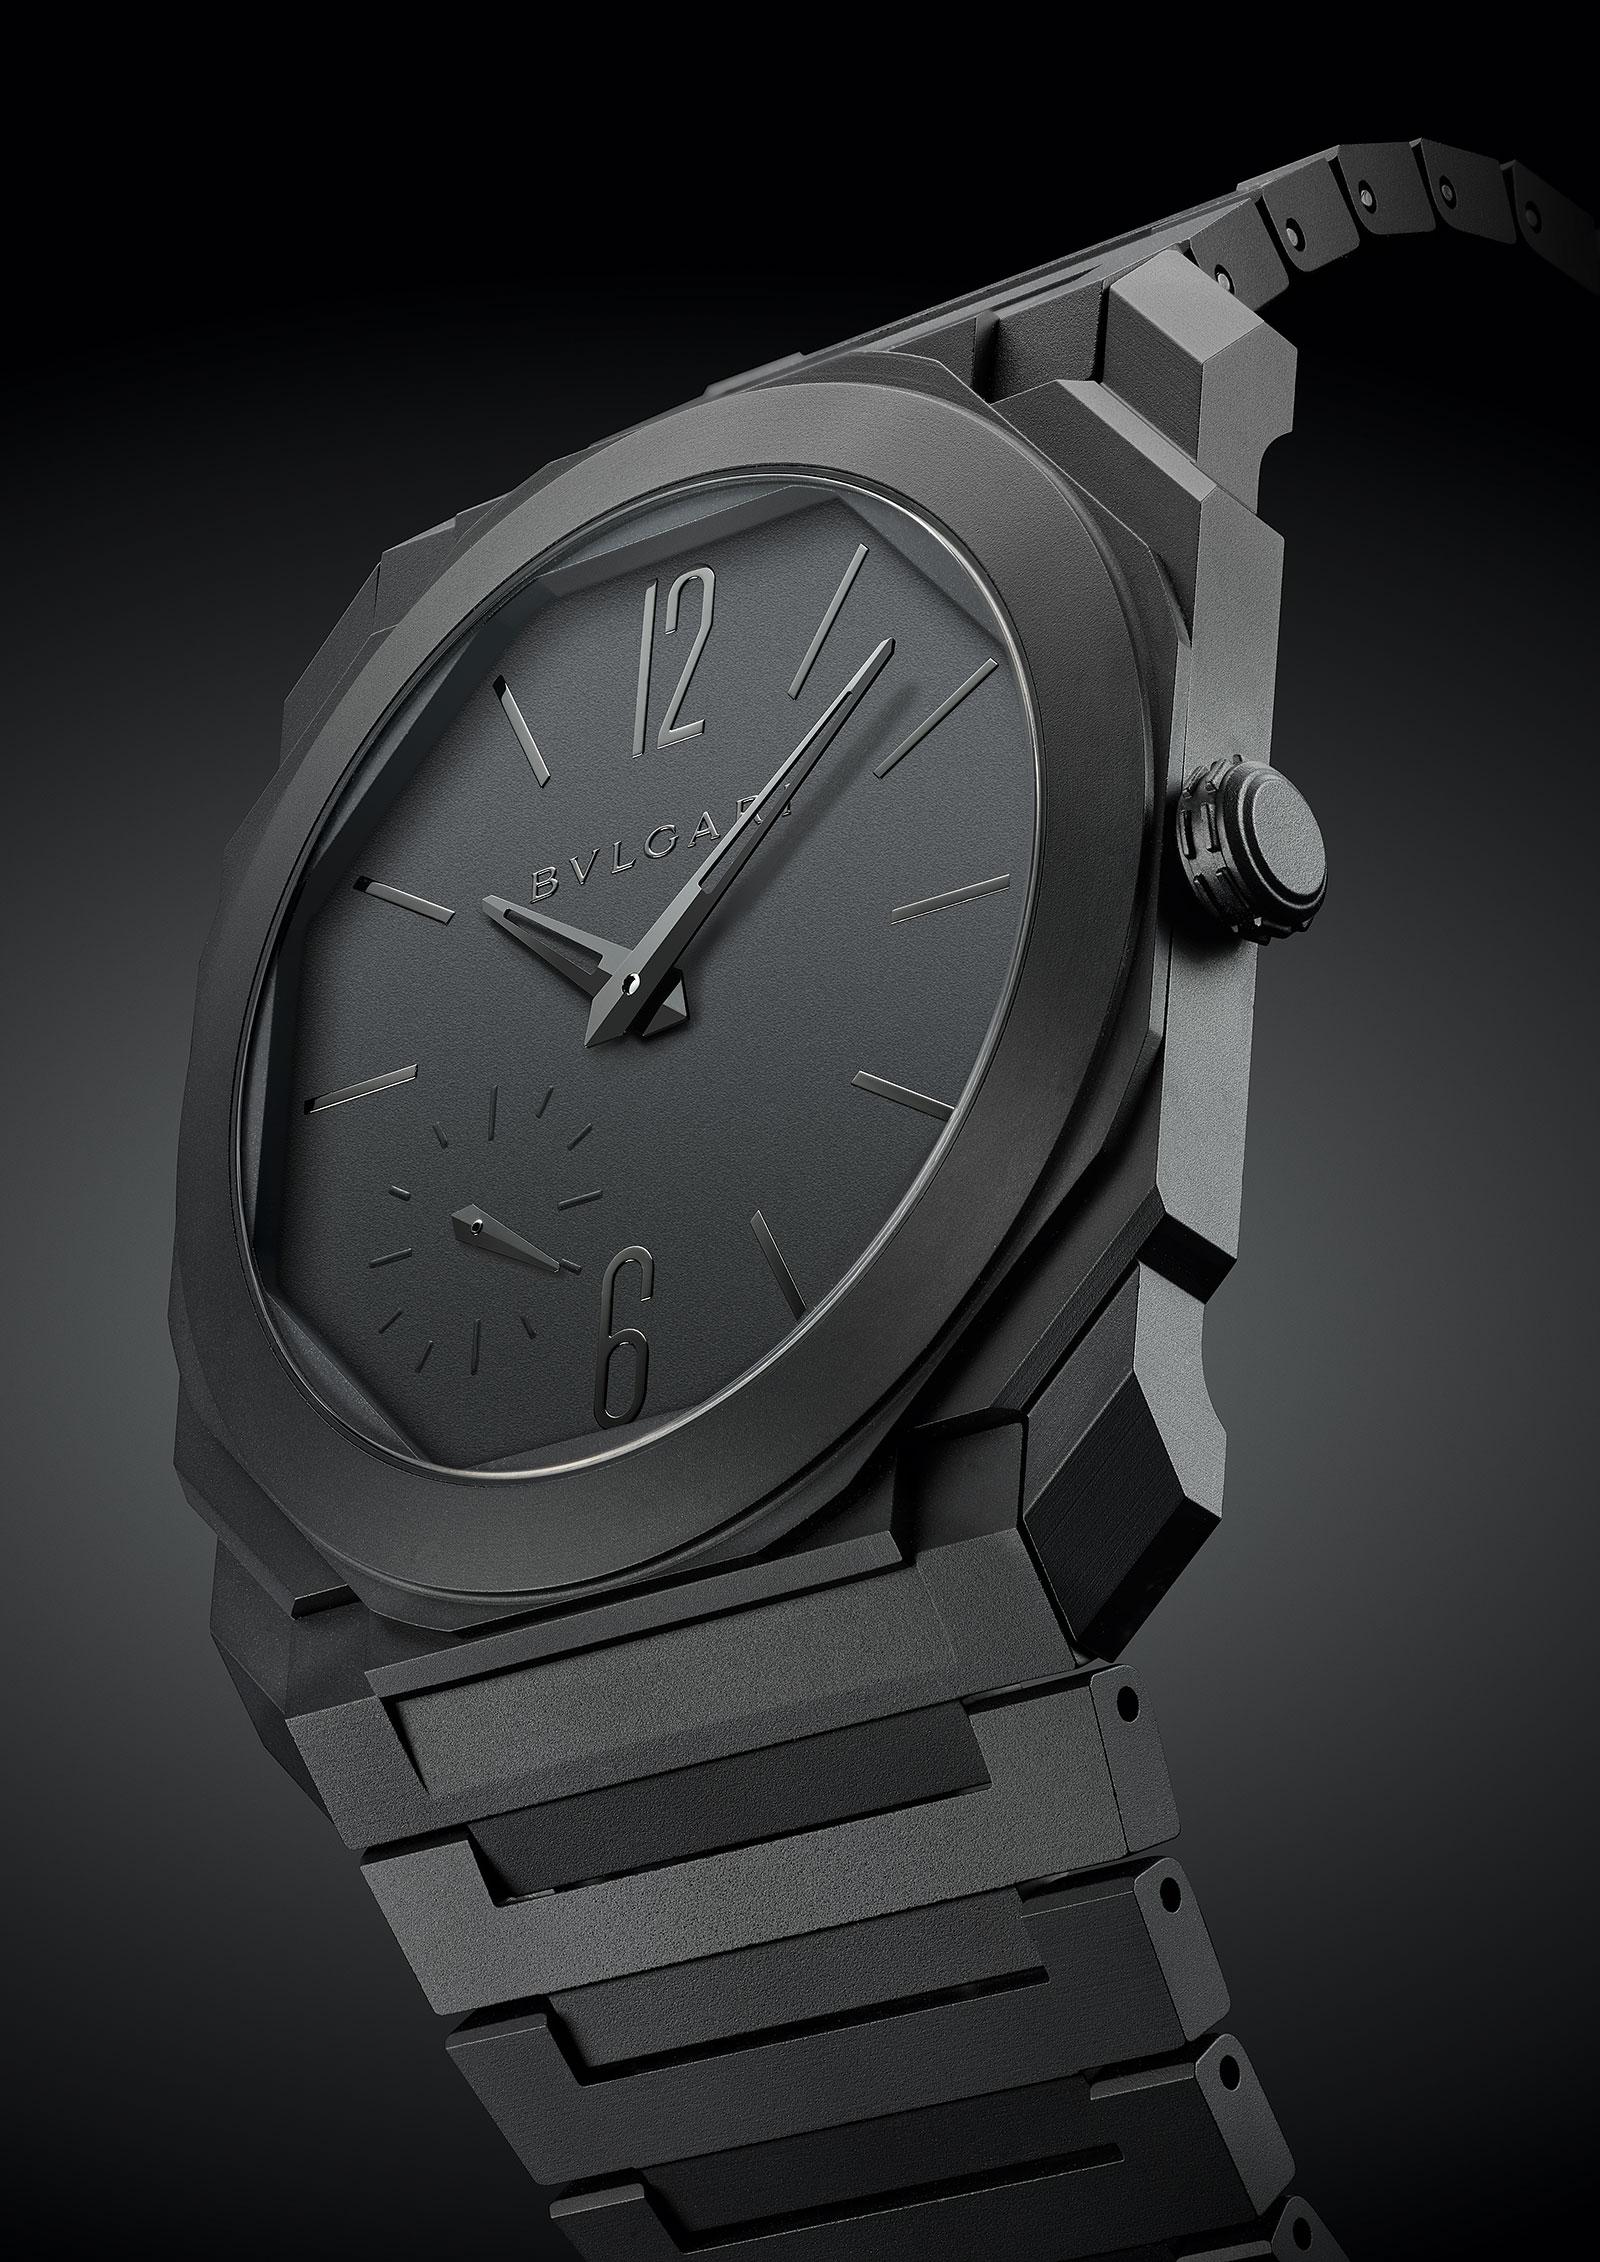 Bvlgari Octo Finissimo Ceramic - Выкуп часов Bvlgari